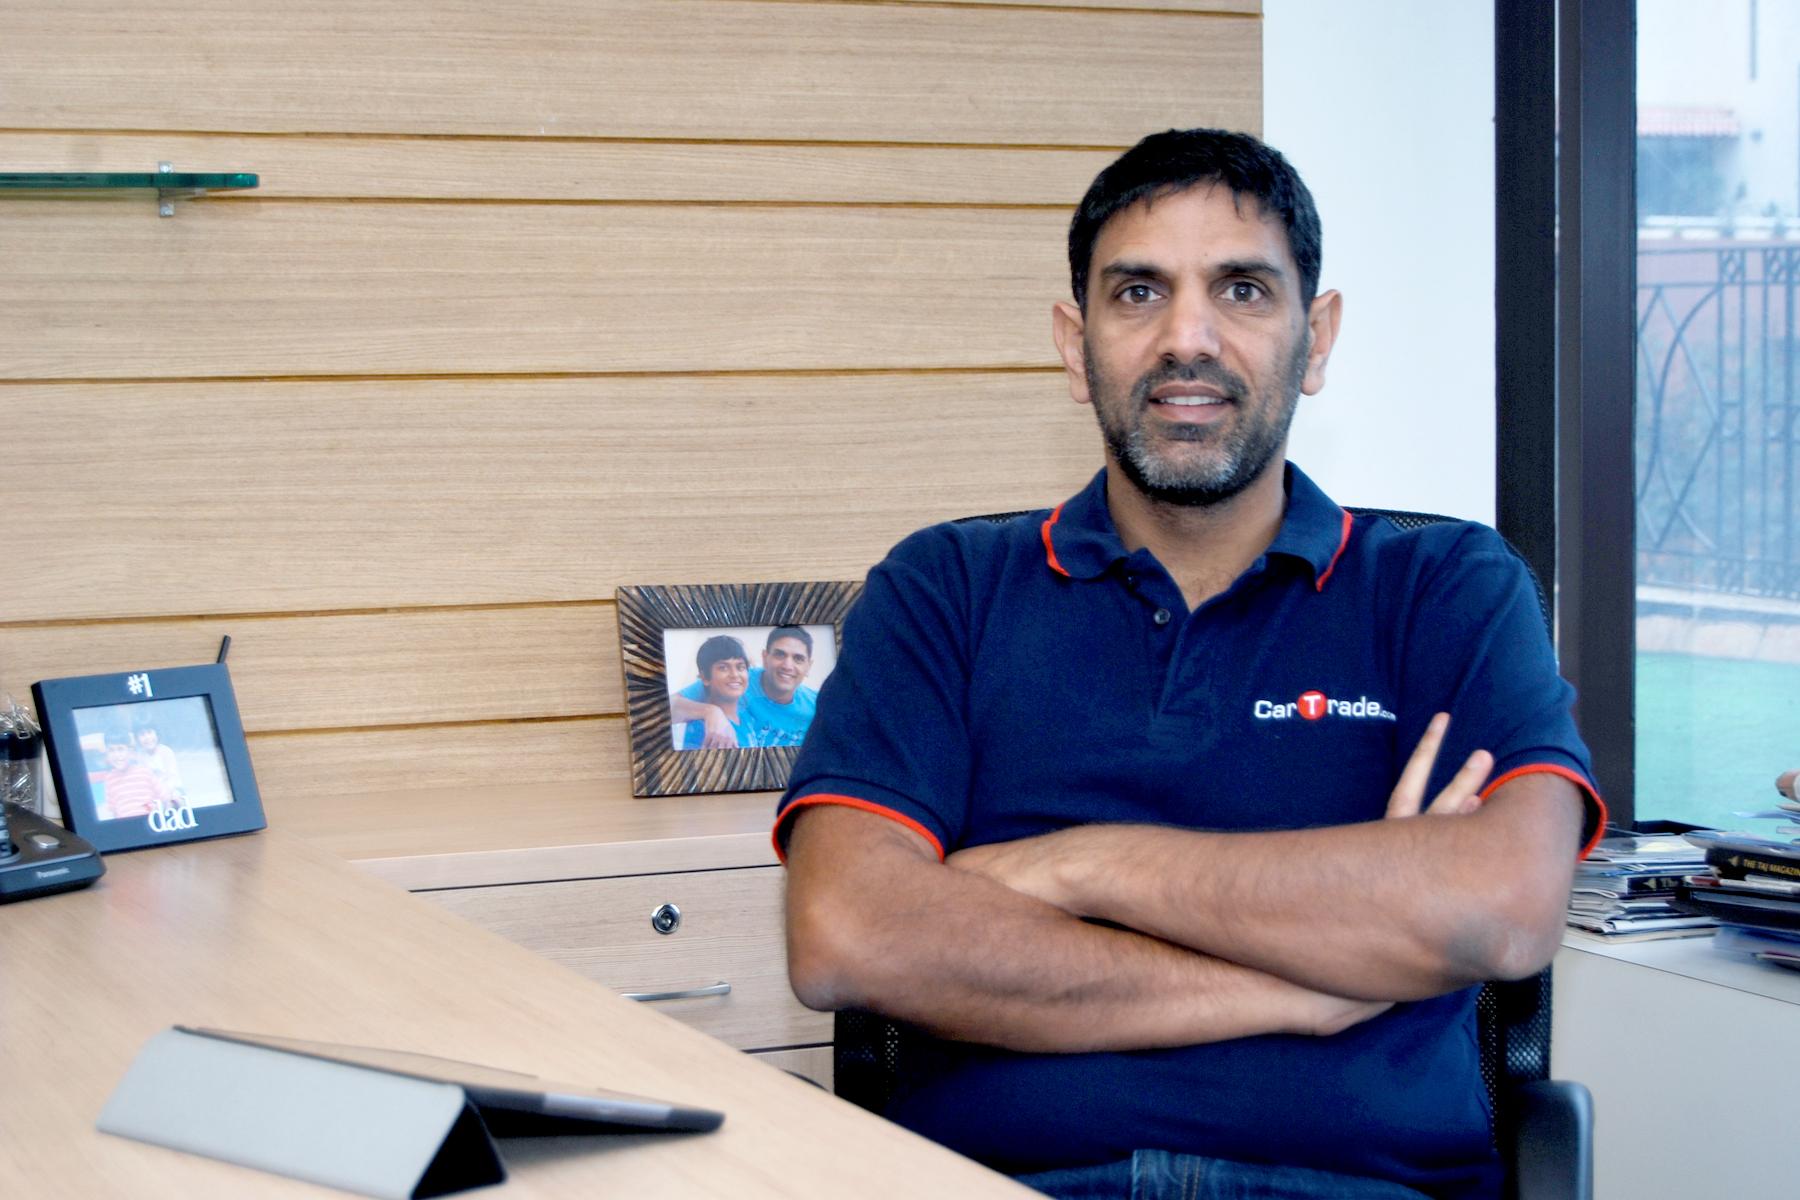 Mr. Vinay Sanghi, CEO, cartrade.com